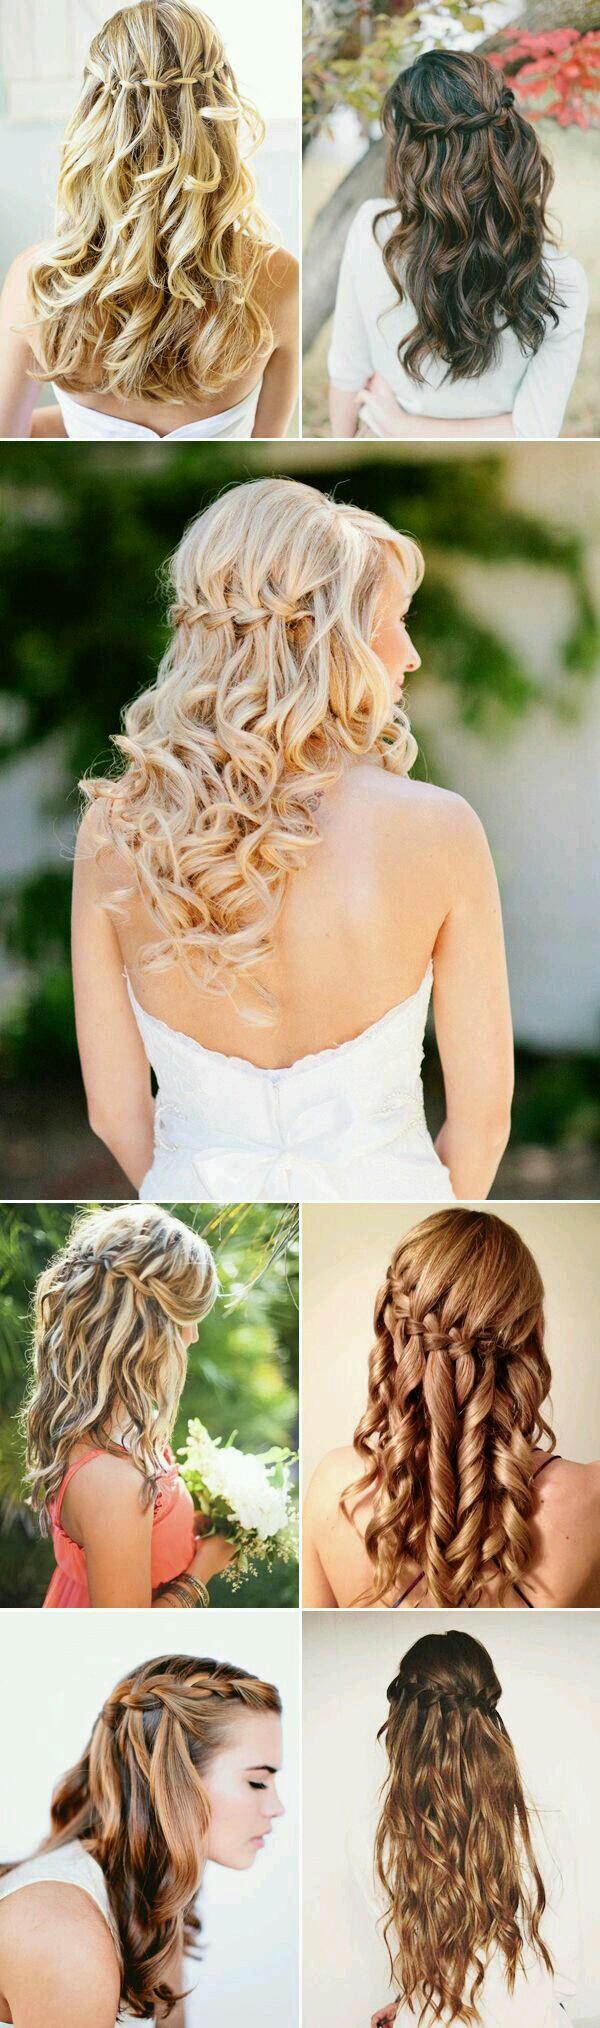 Pin by Veni Mitreva on Hairstyles Pinterest